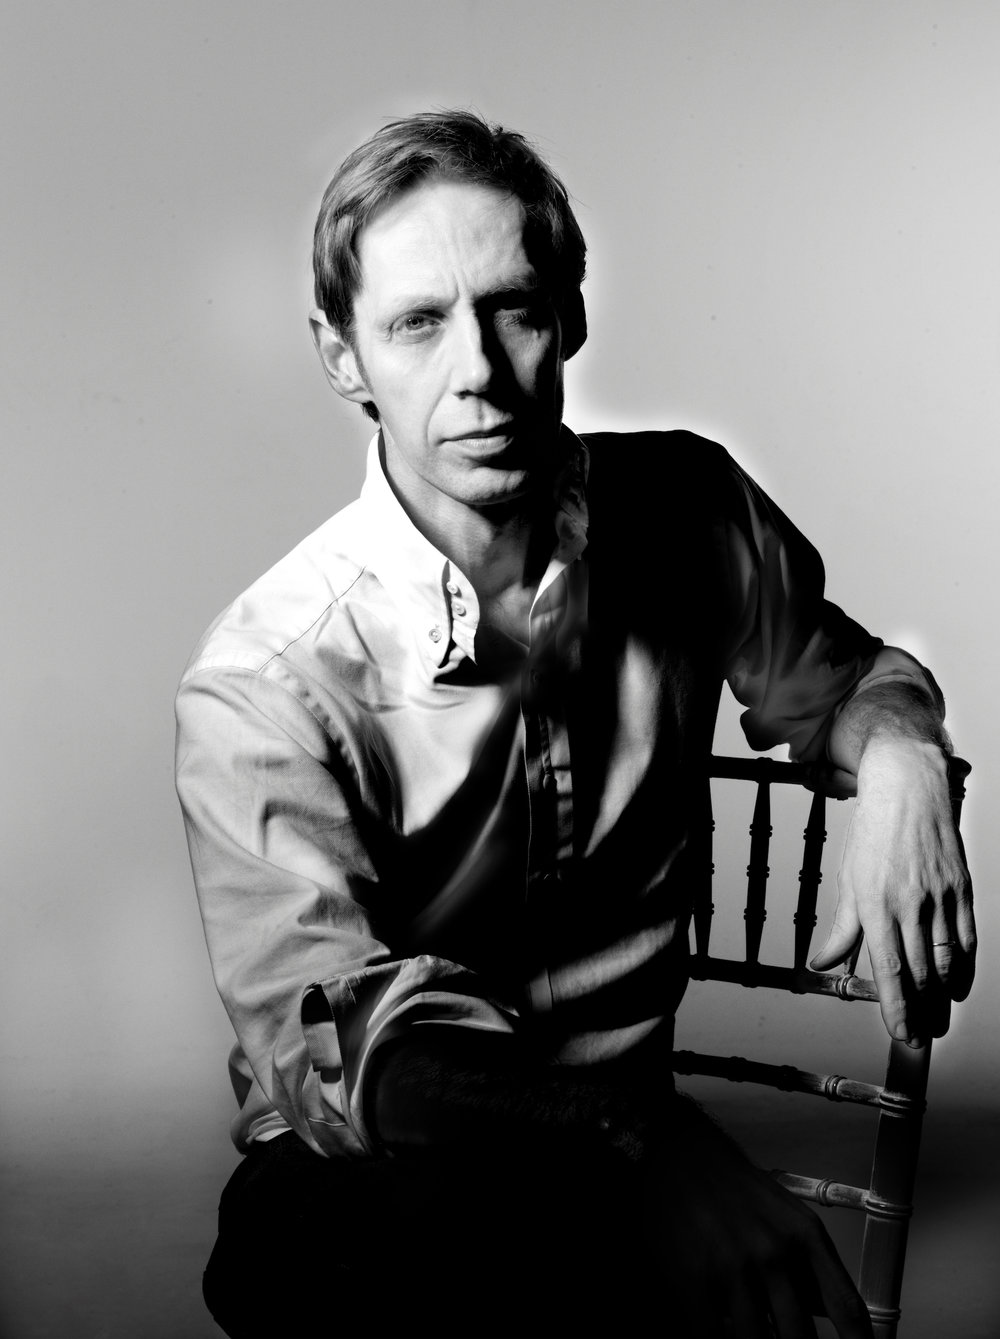 Portrait of Nick Knight ⓒ NICK KNIGHT